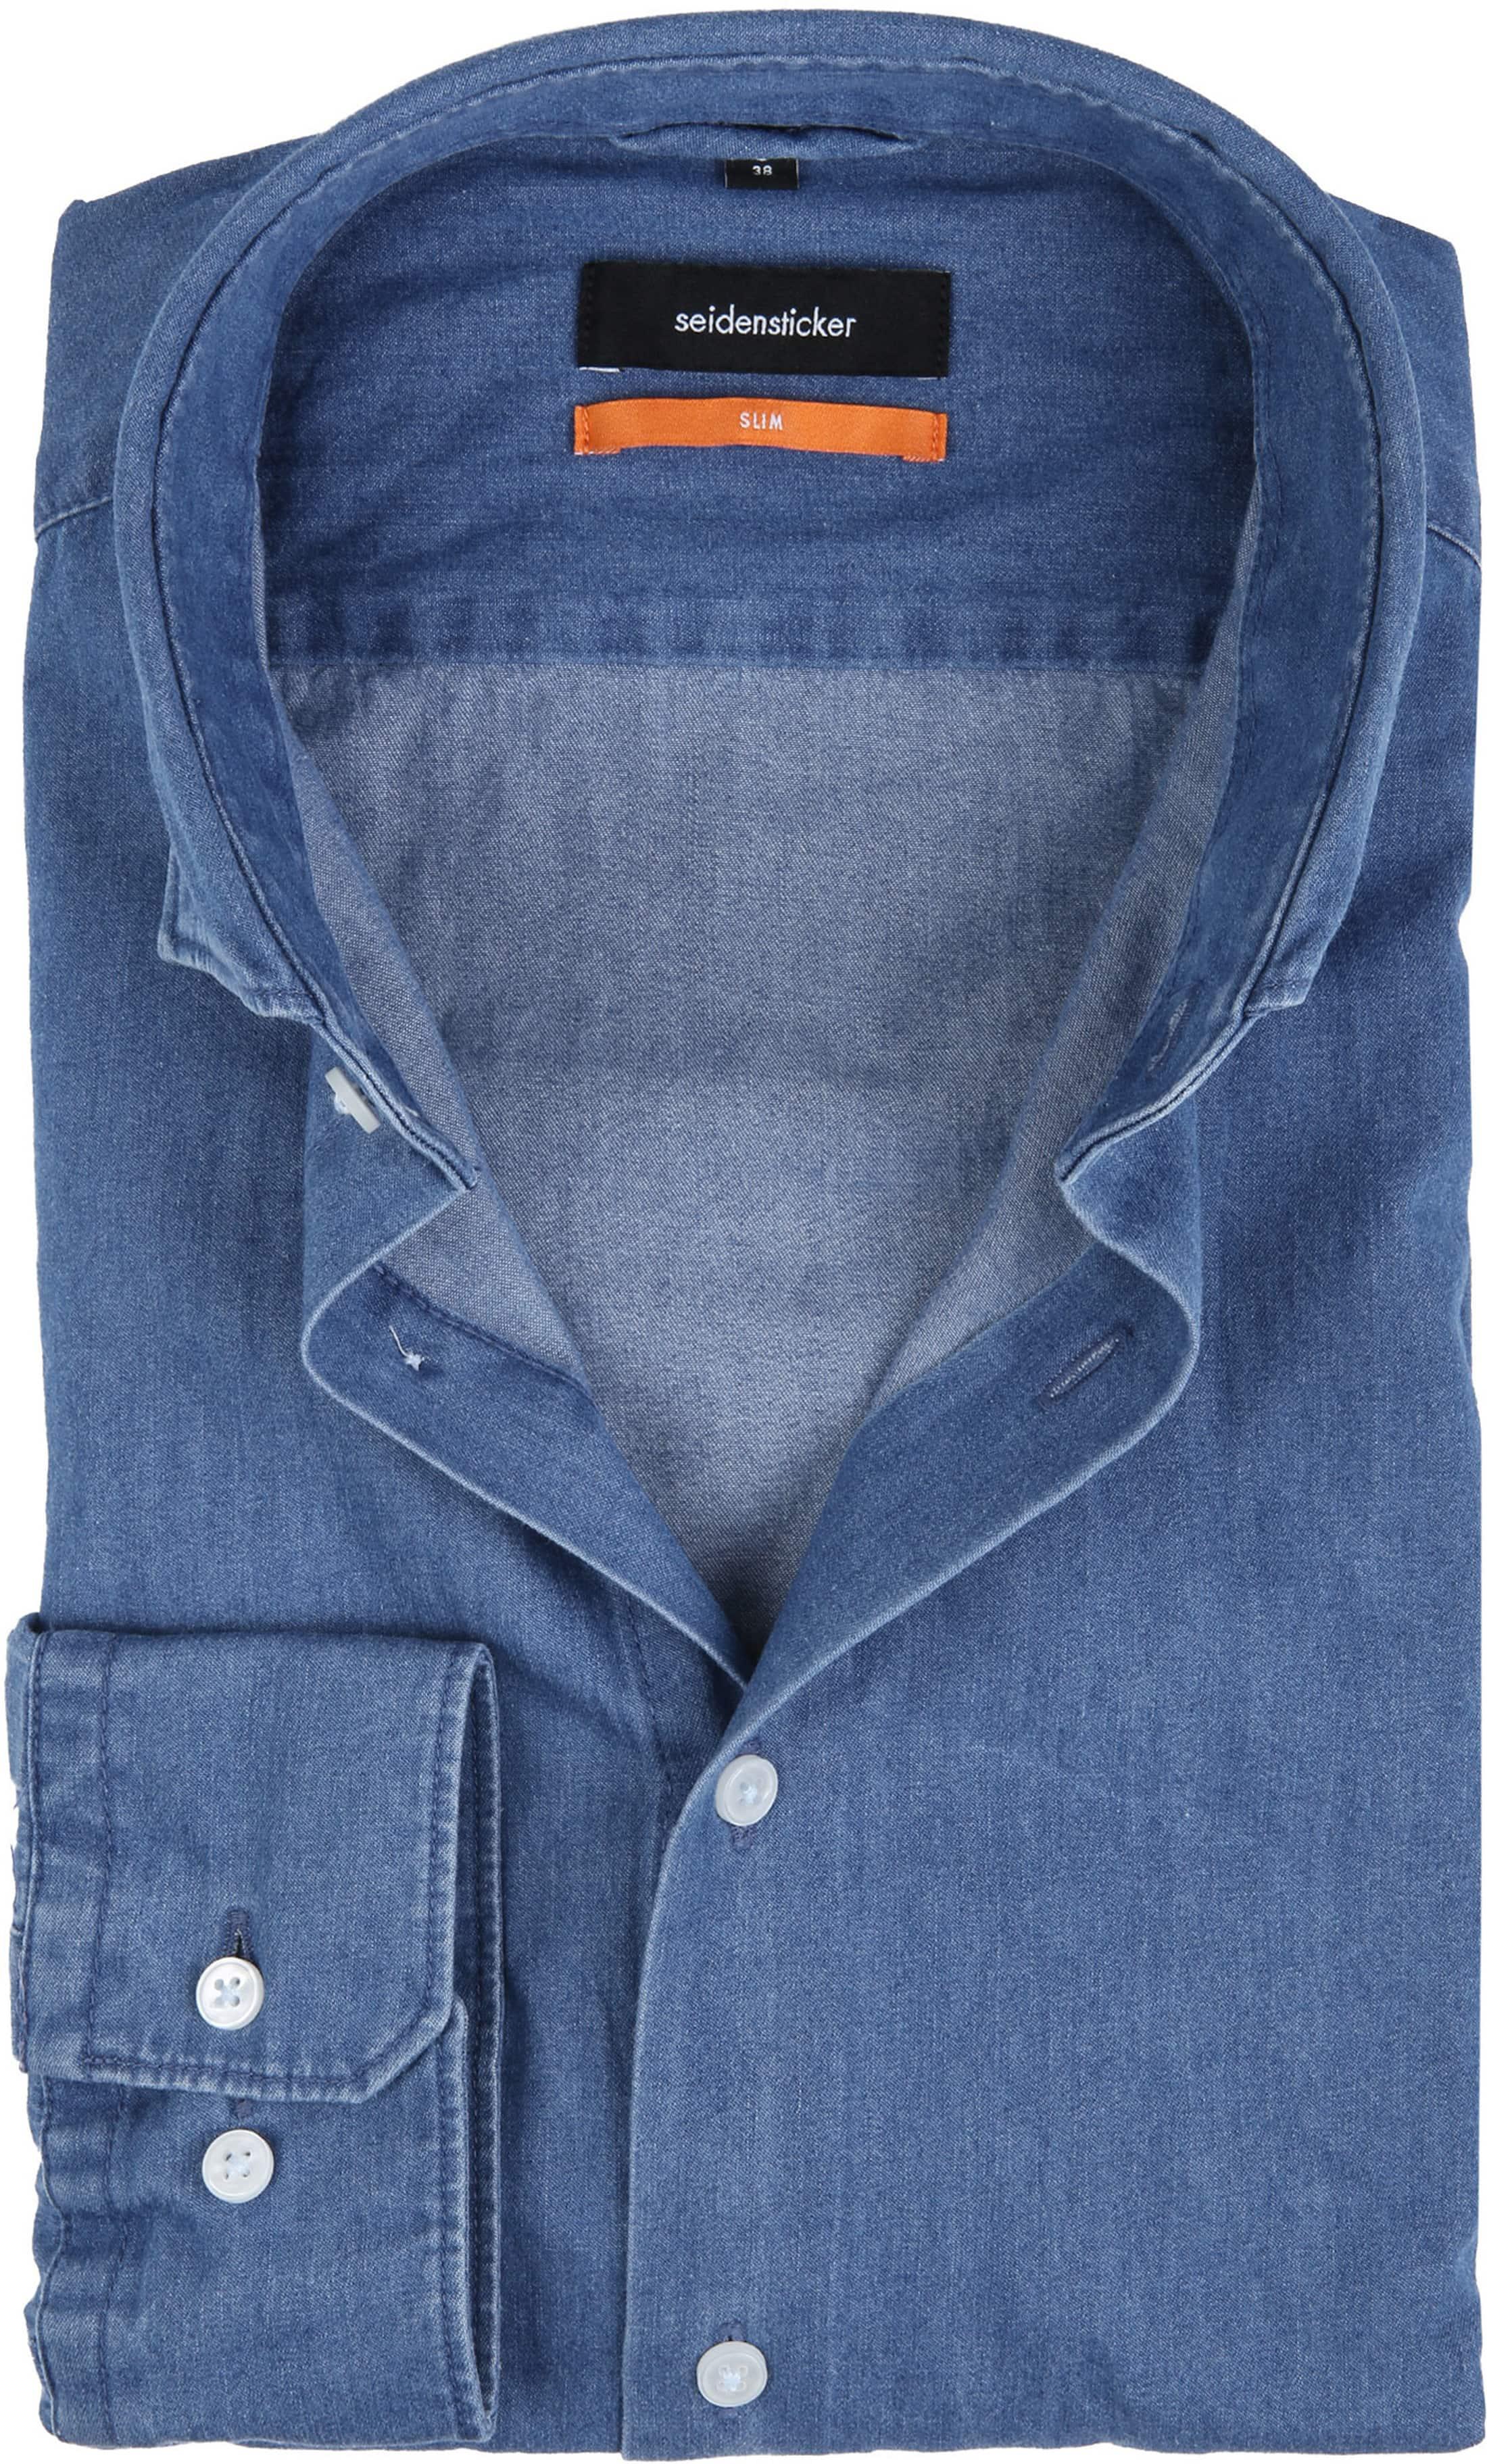 Seidensticker Shirt SF Denim Blue